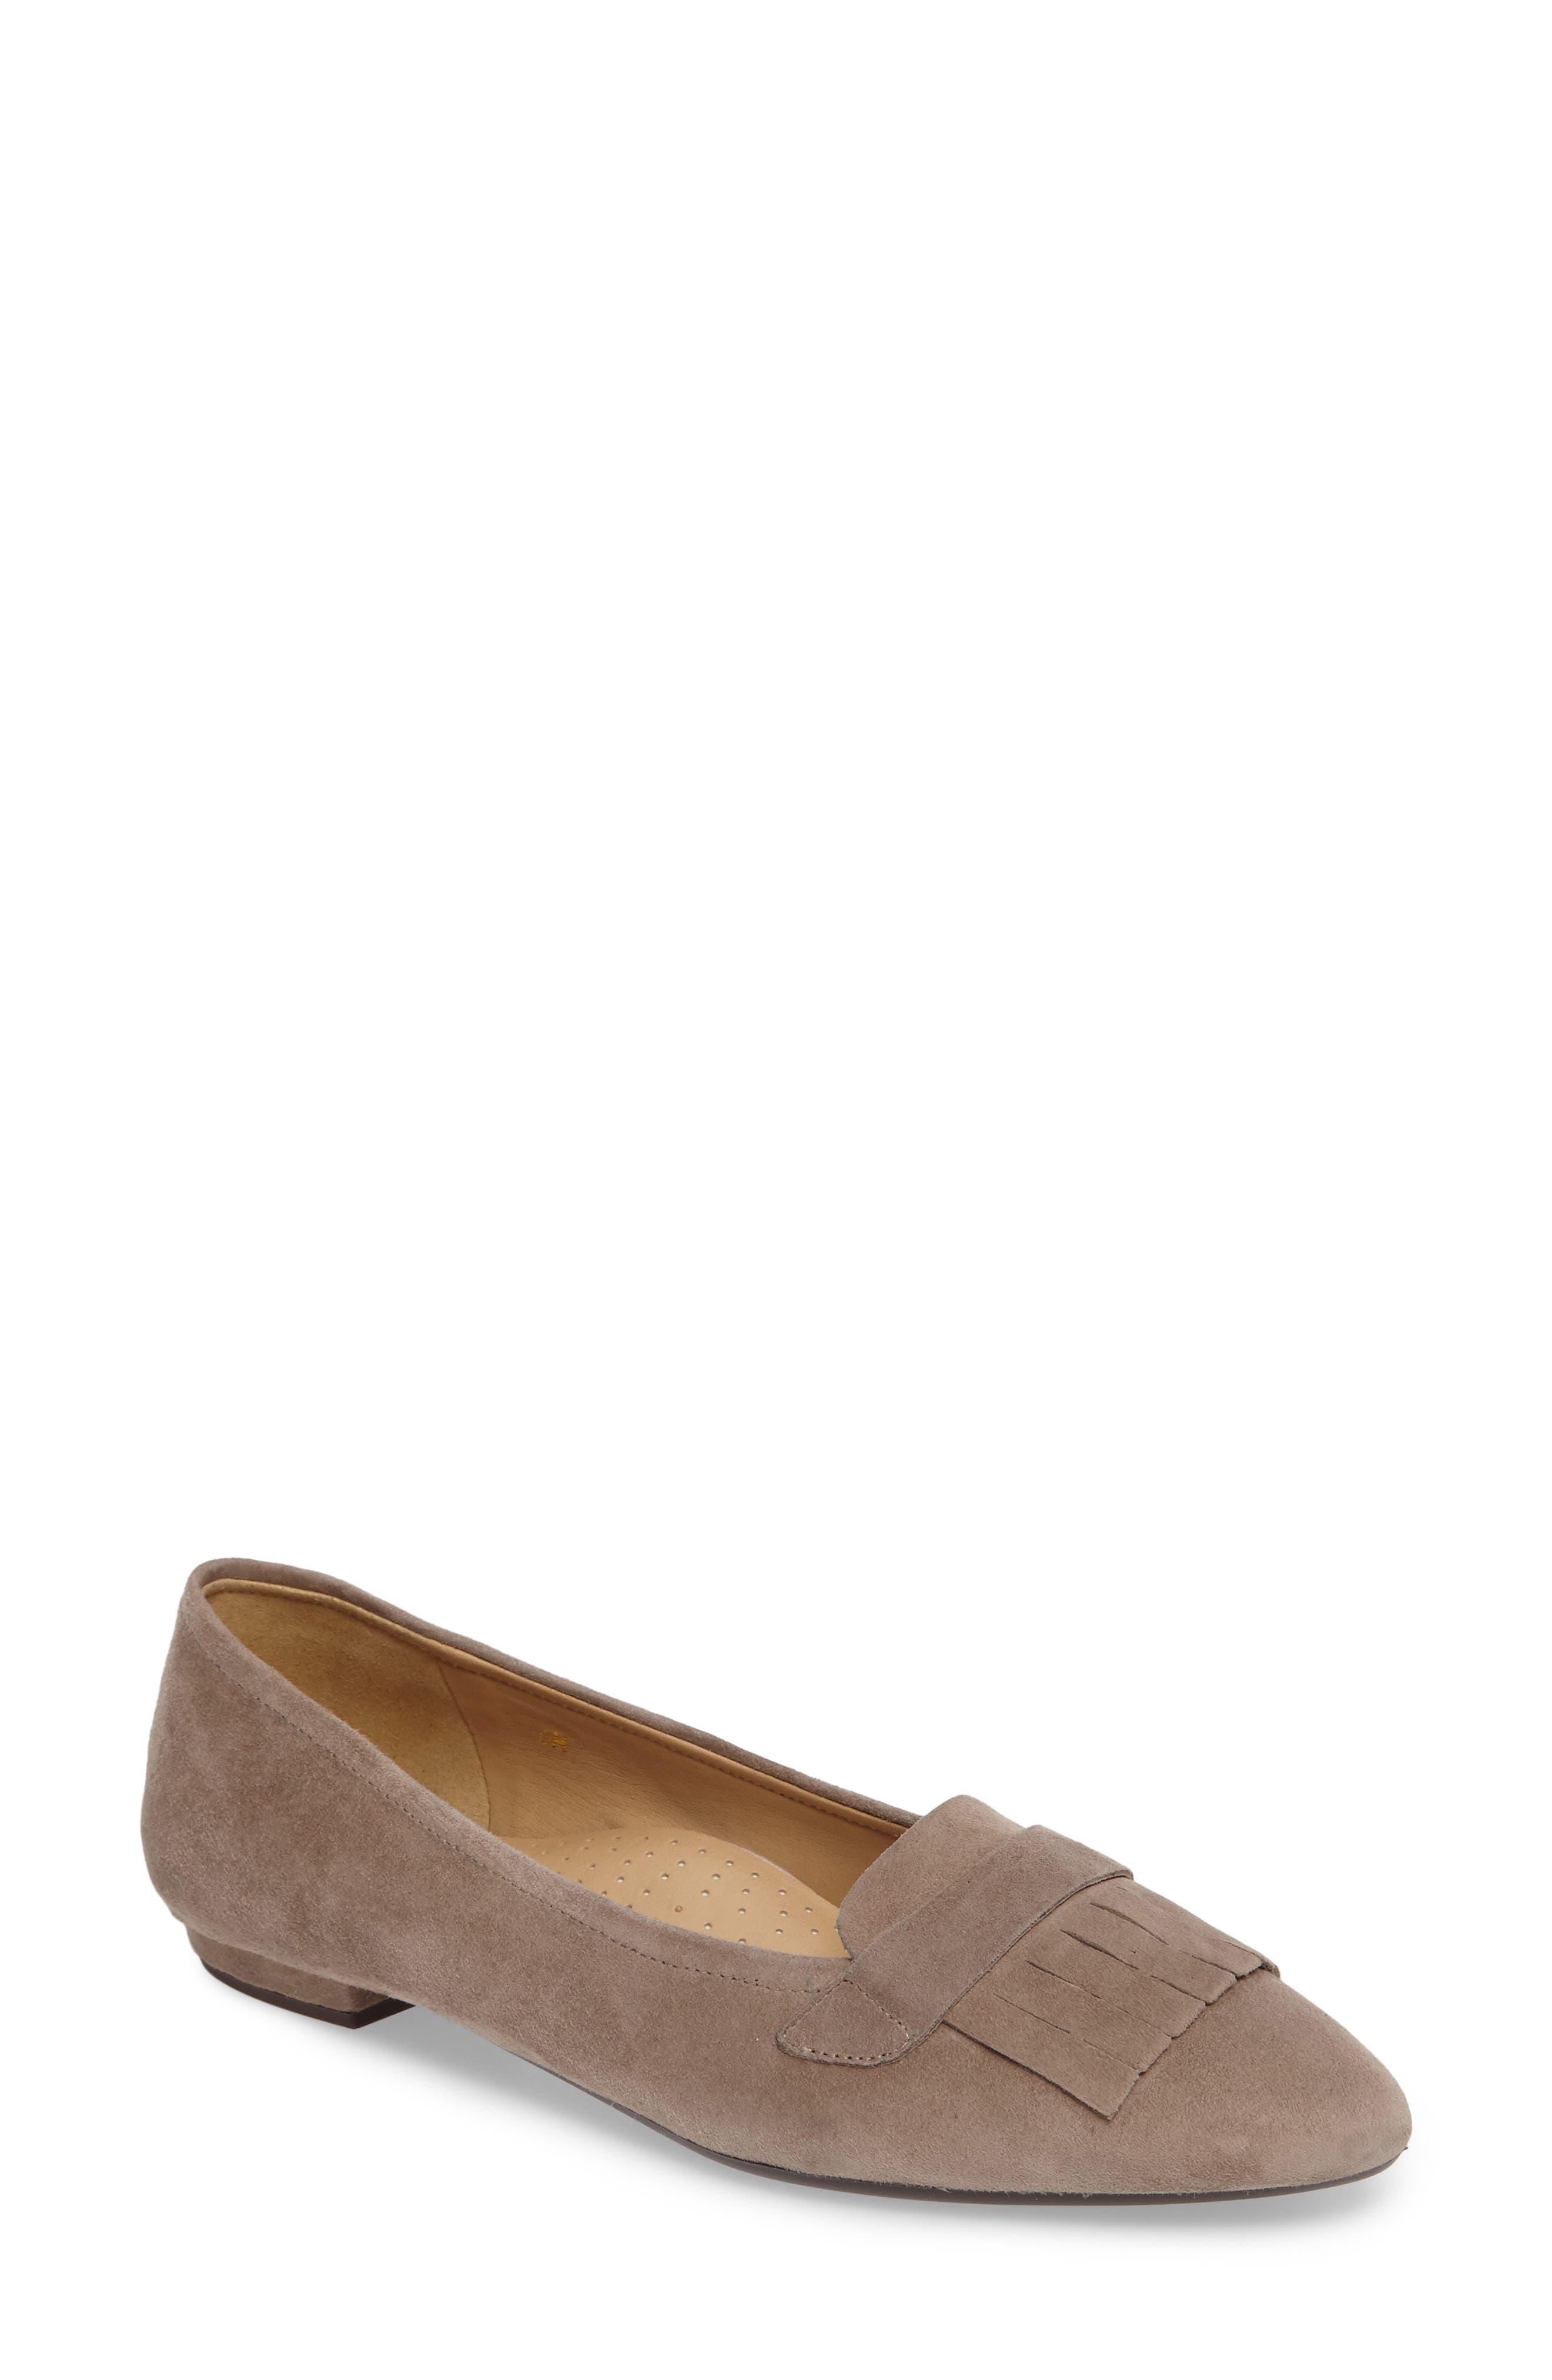 Main Image - VANELi Gaea Loafer Flat (Women)